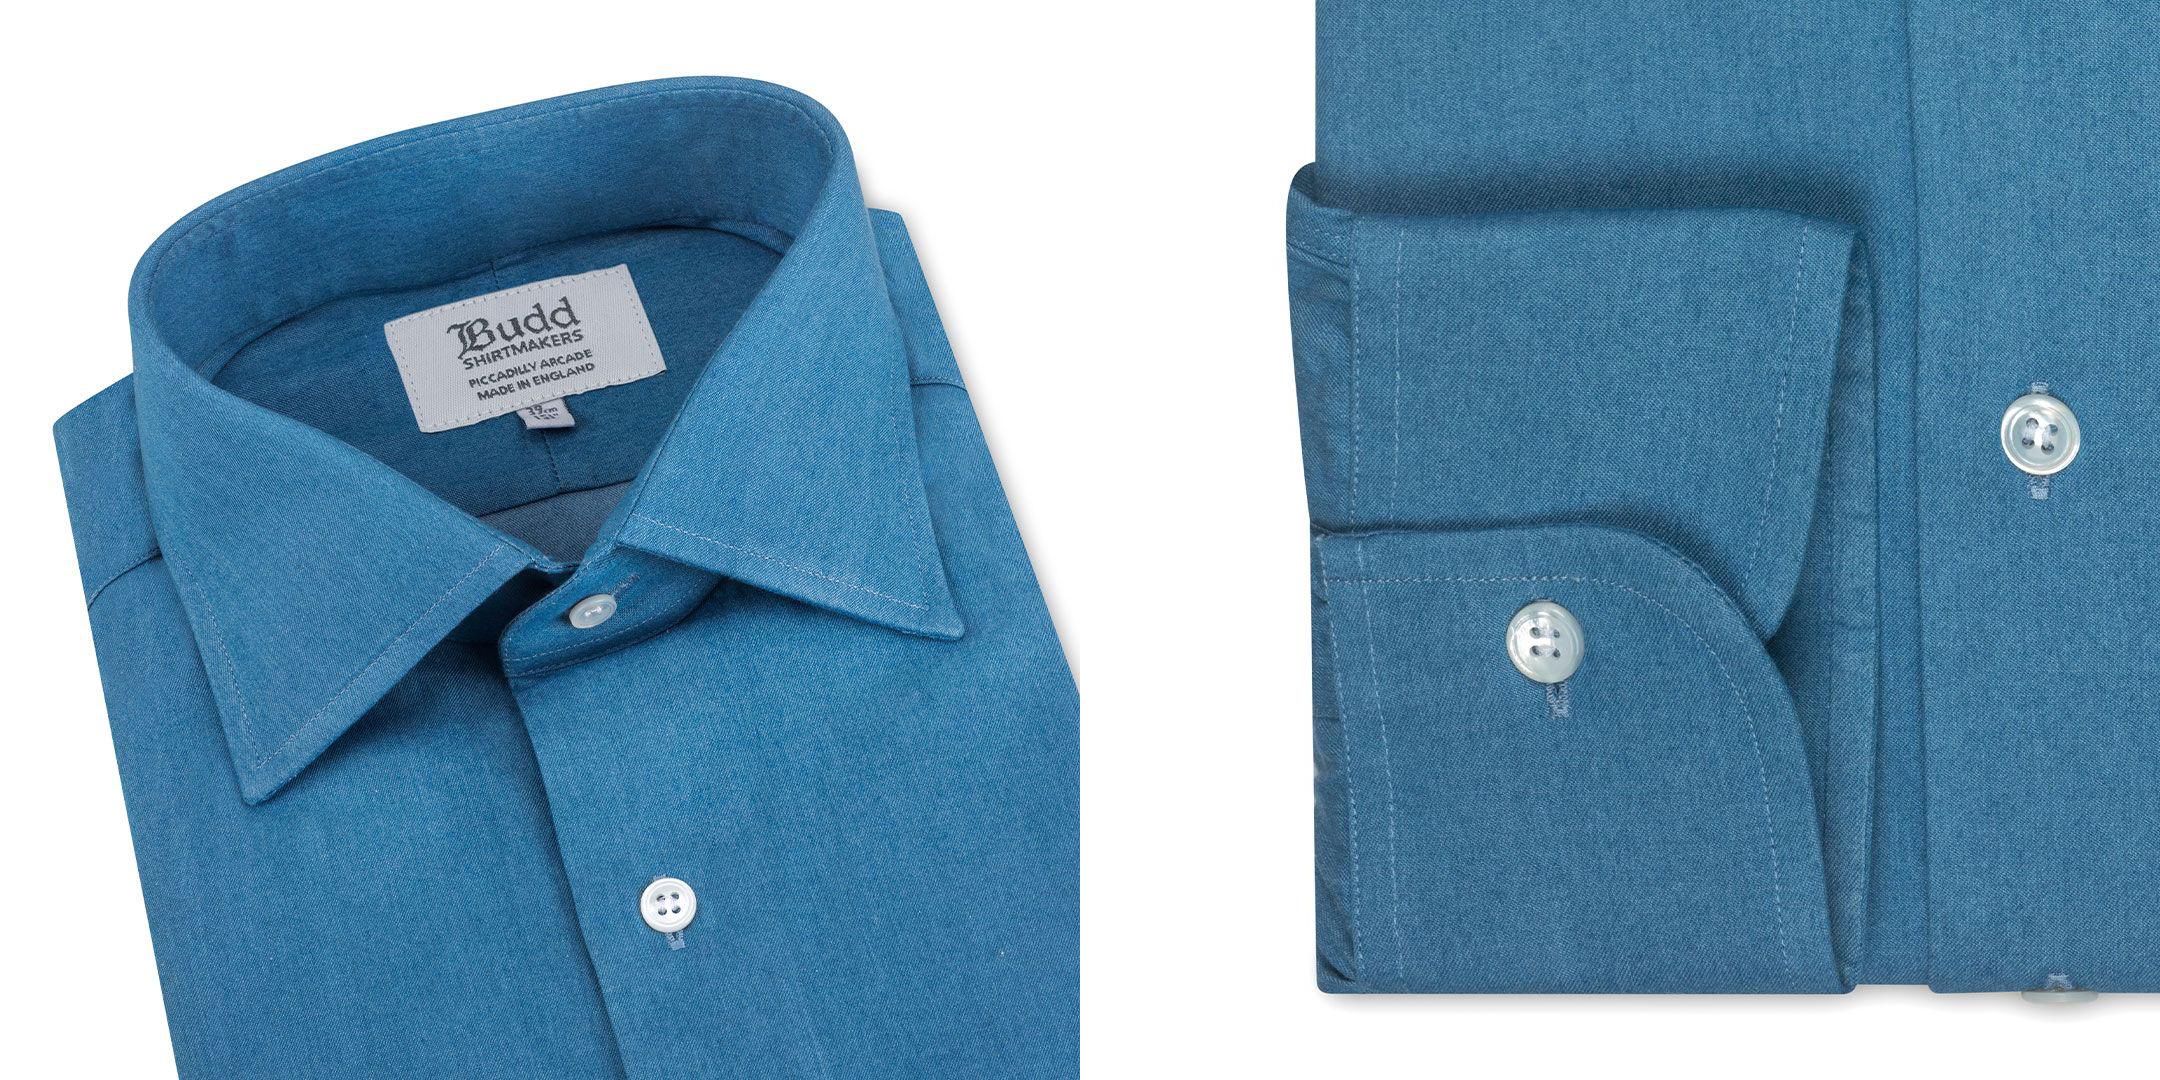 Details of Budd's smart-casual denim shirt.